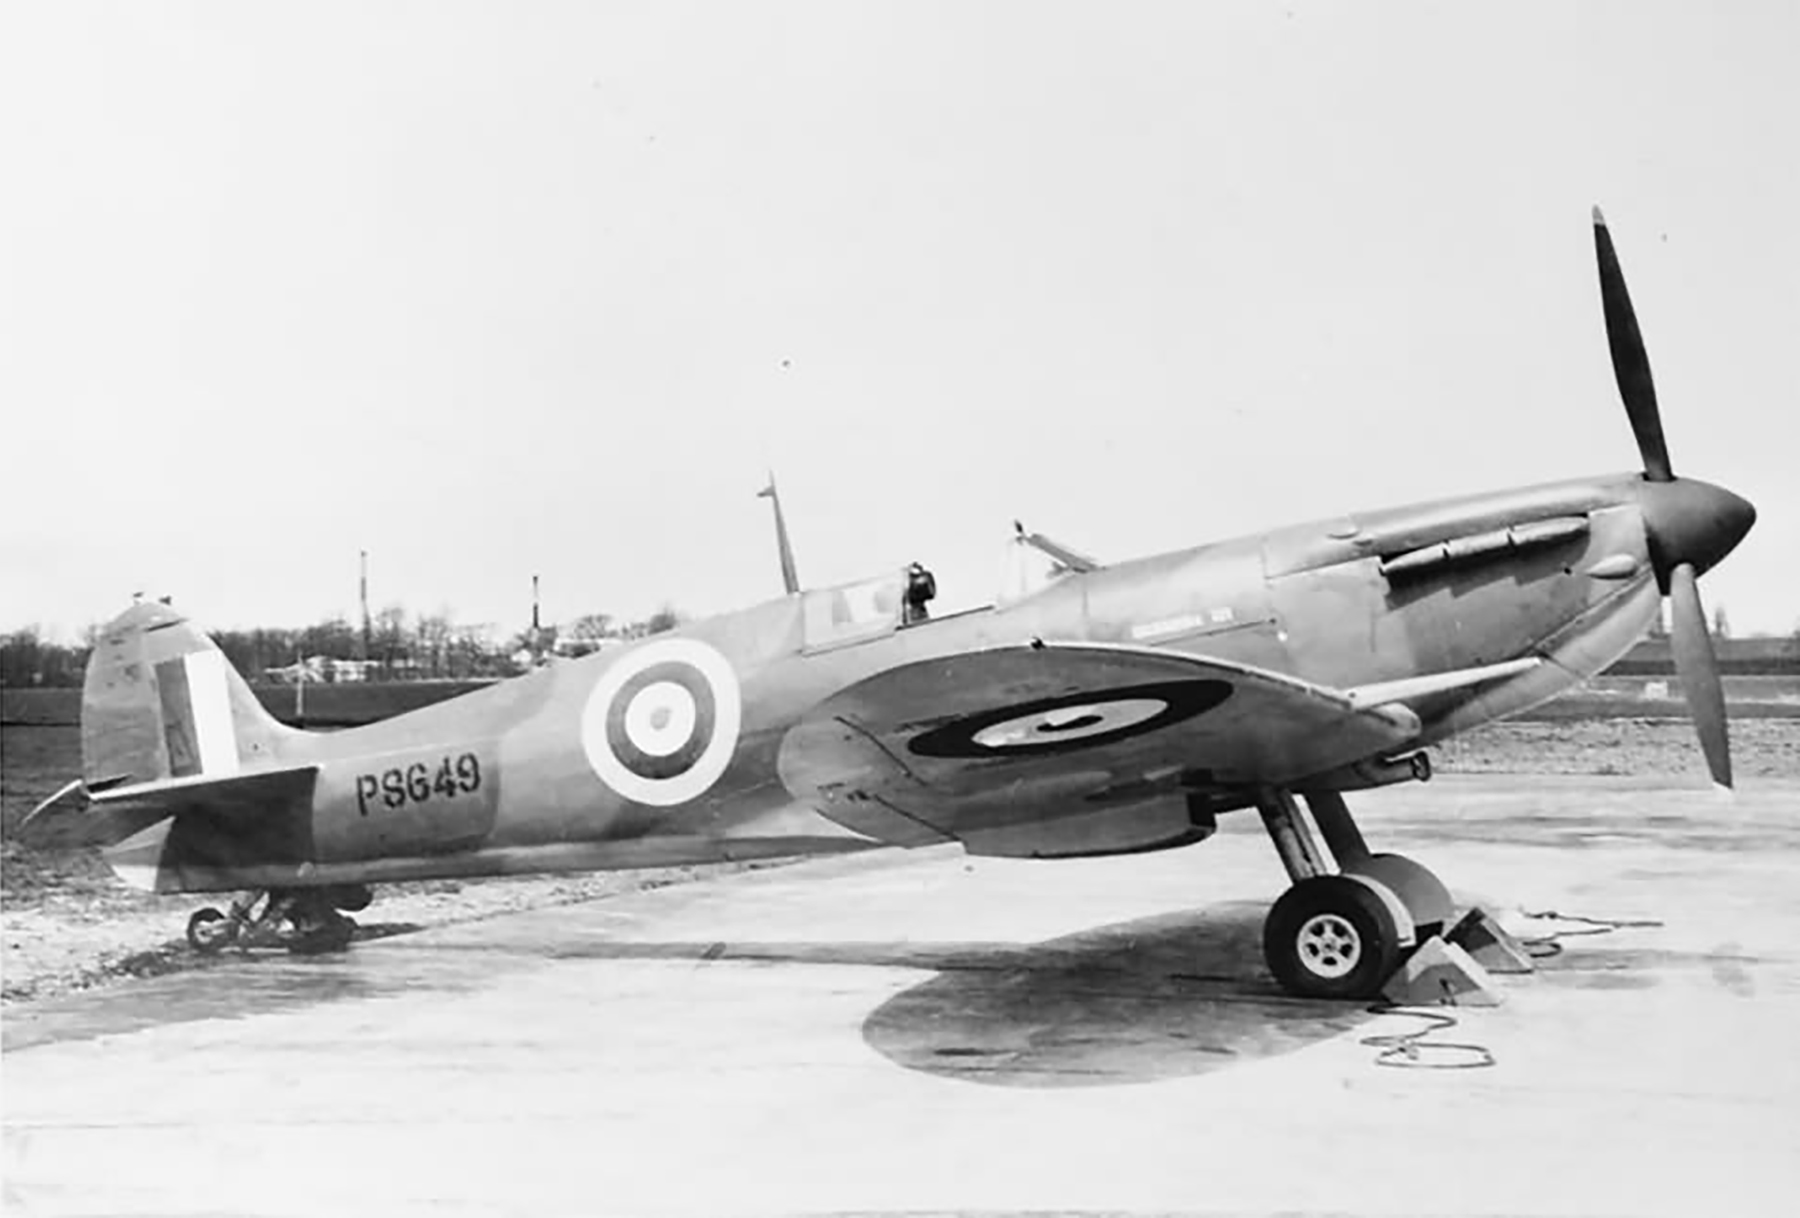 Factory fresh Spitfire MkIIb P8649 named Bermuda III England 1941 web 01